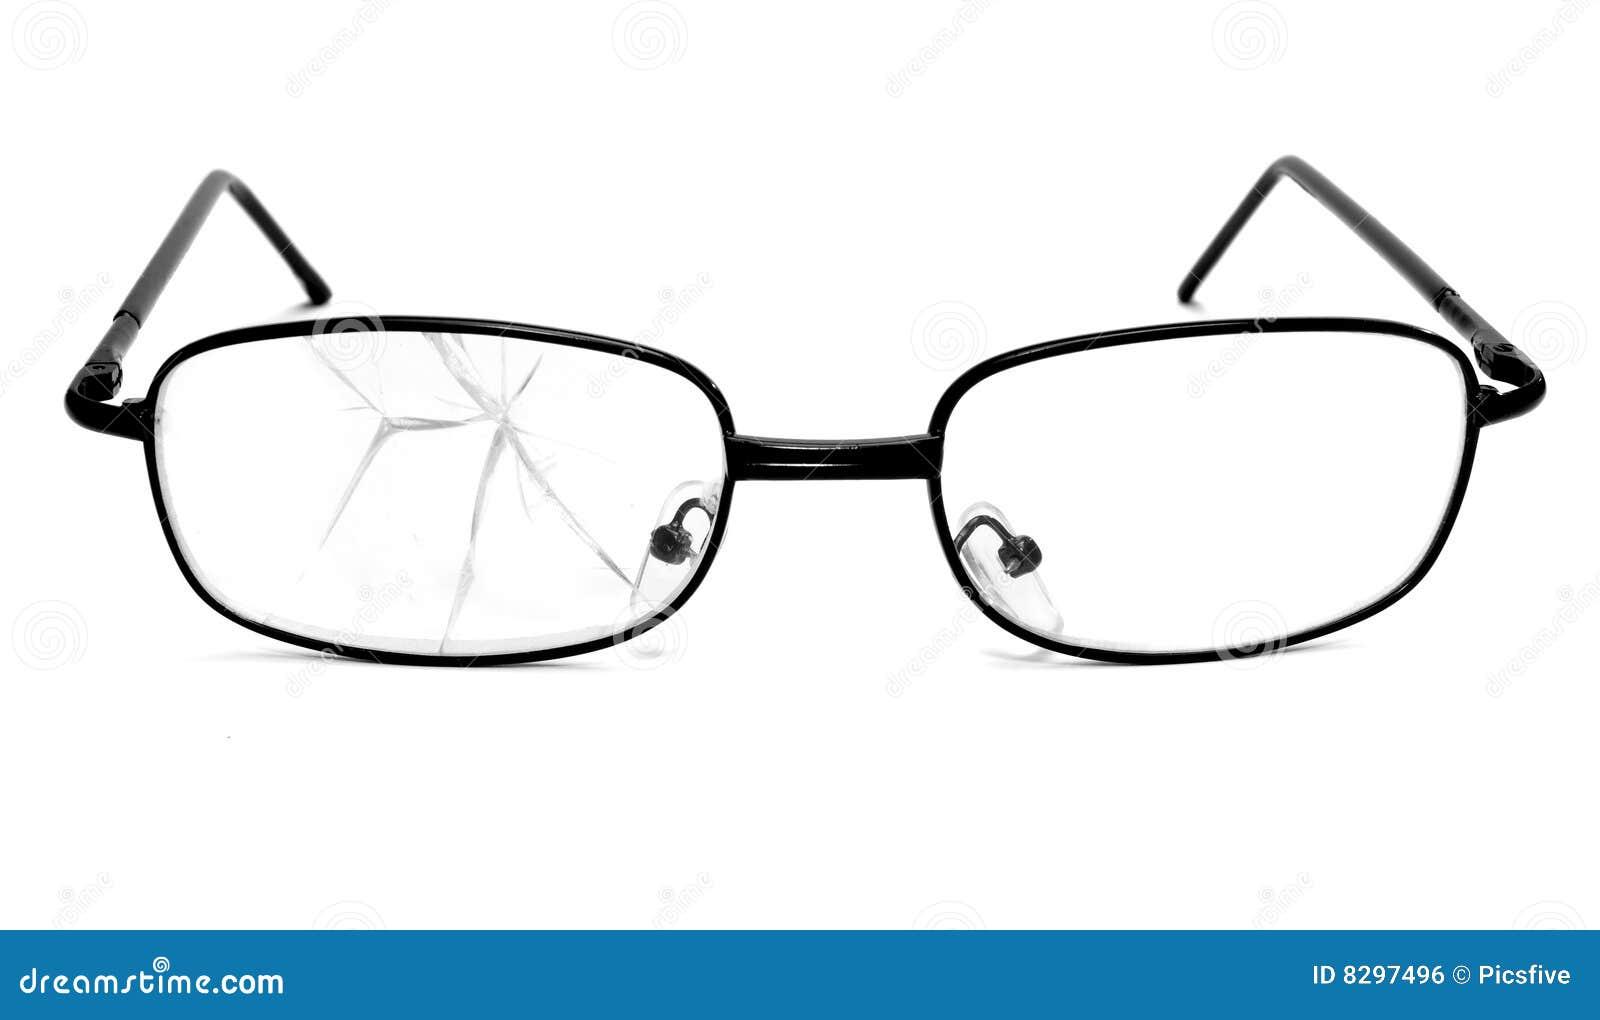 Broken Glasses Arm